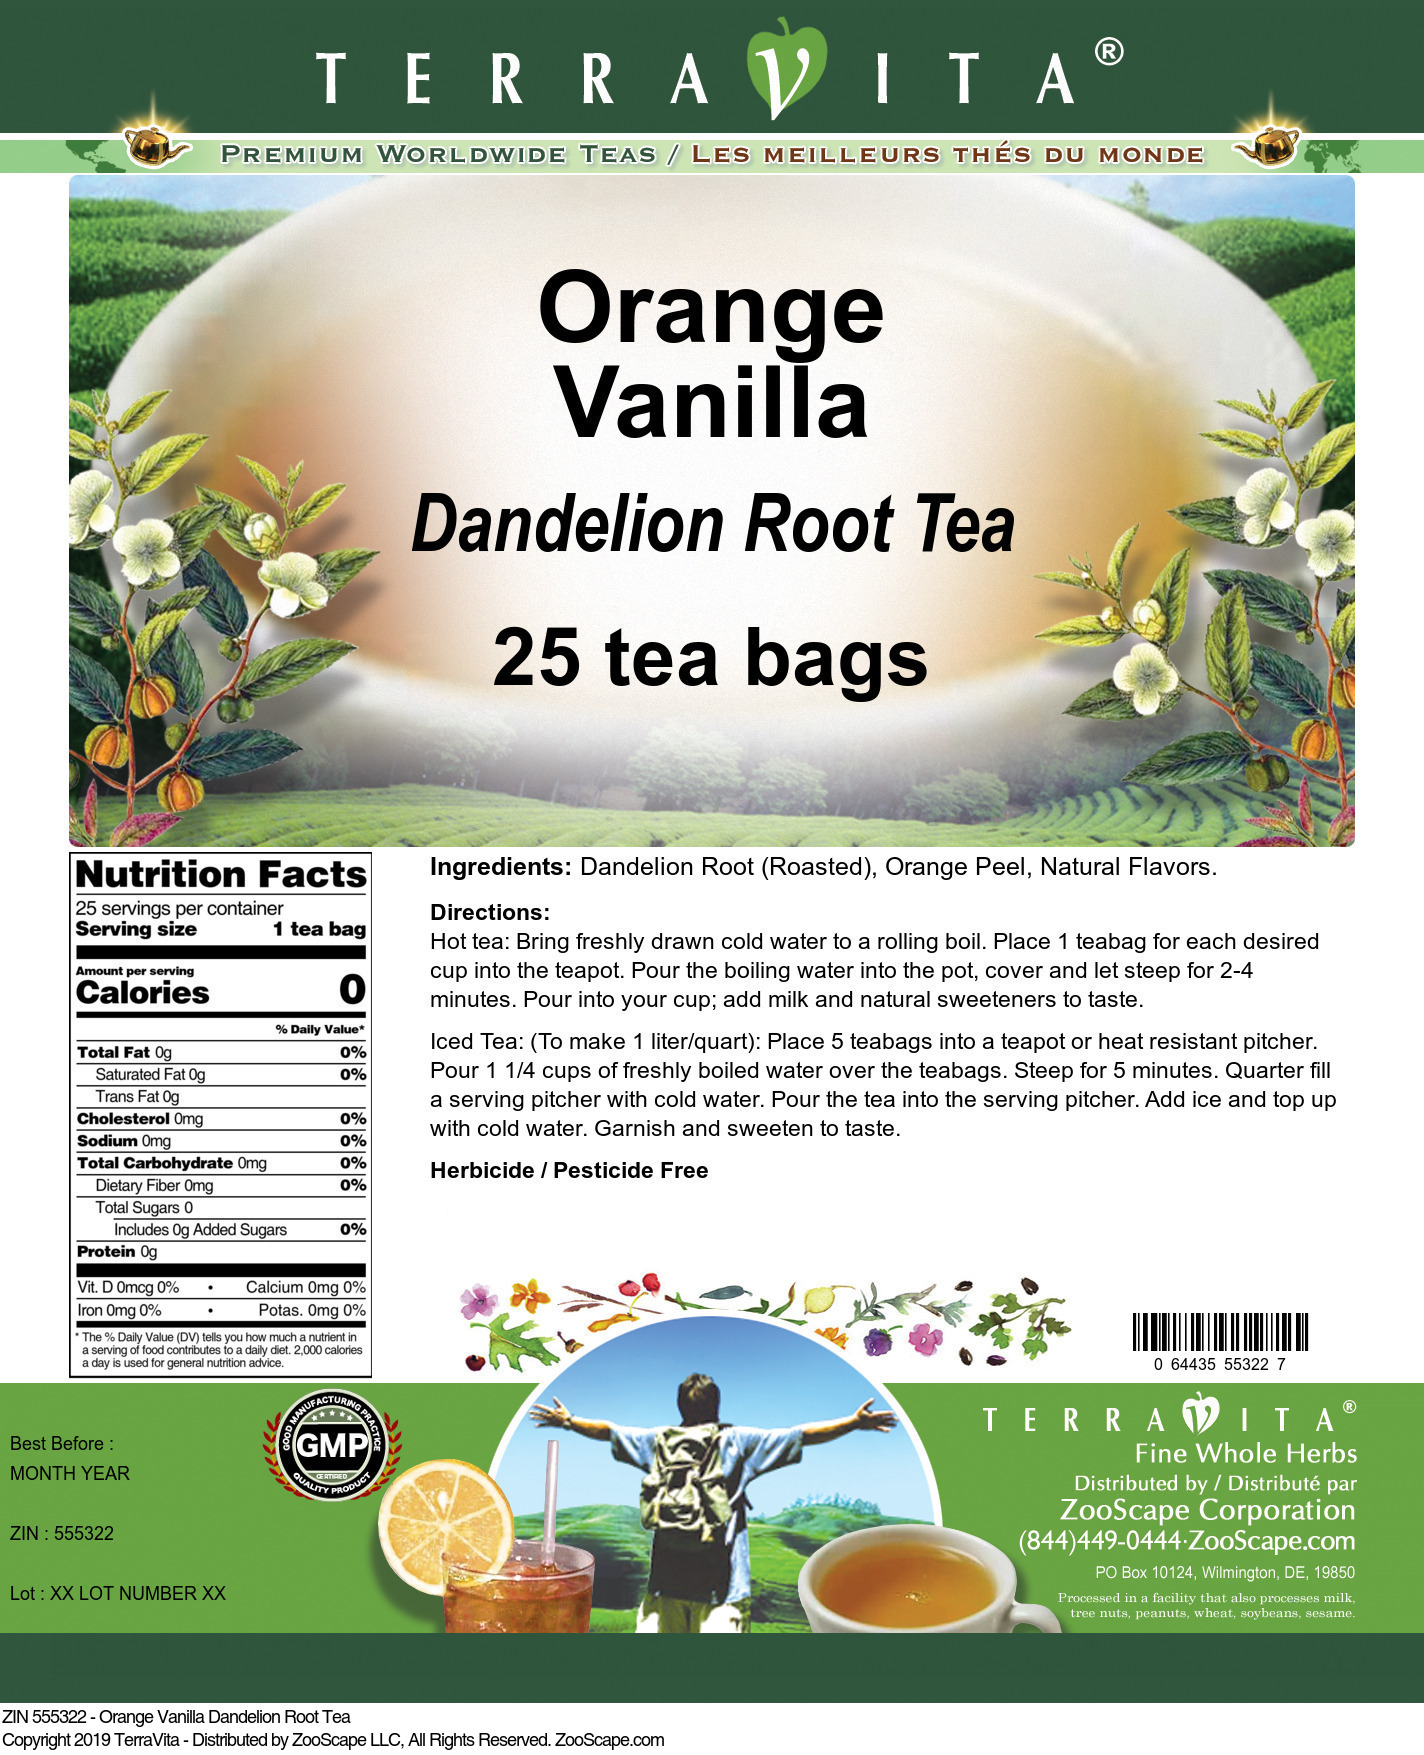 Orange Vanilla Dandelion Root Tea